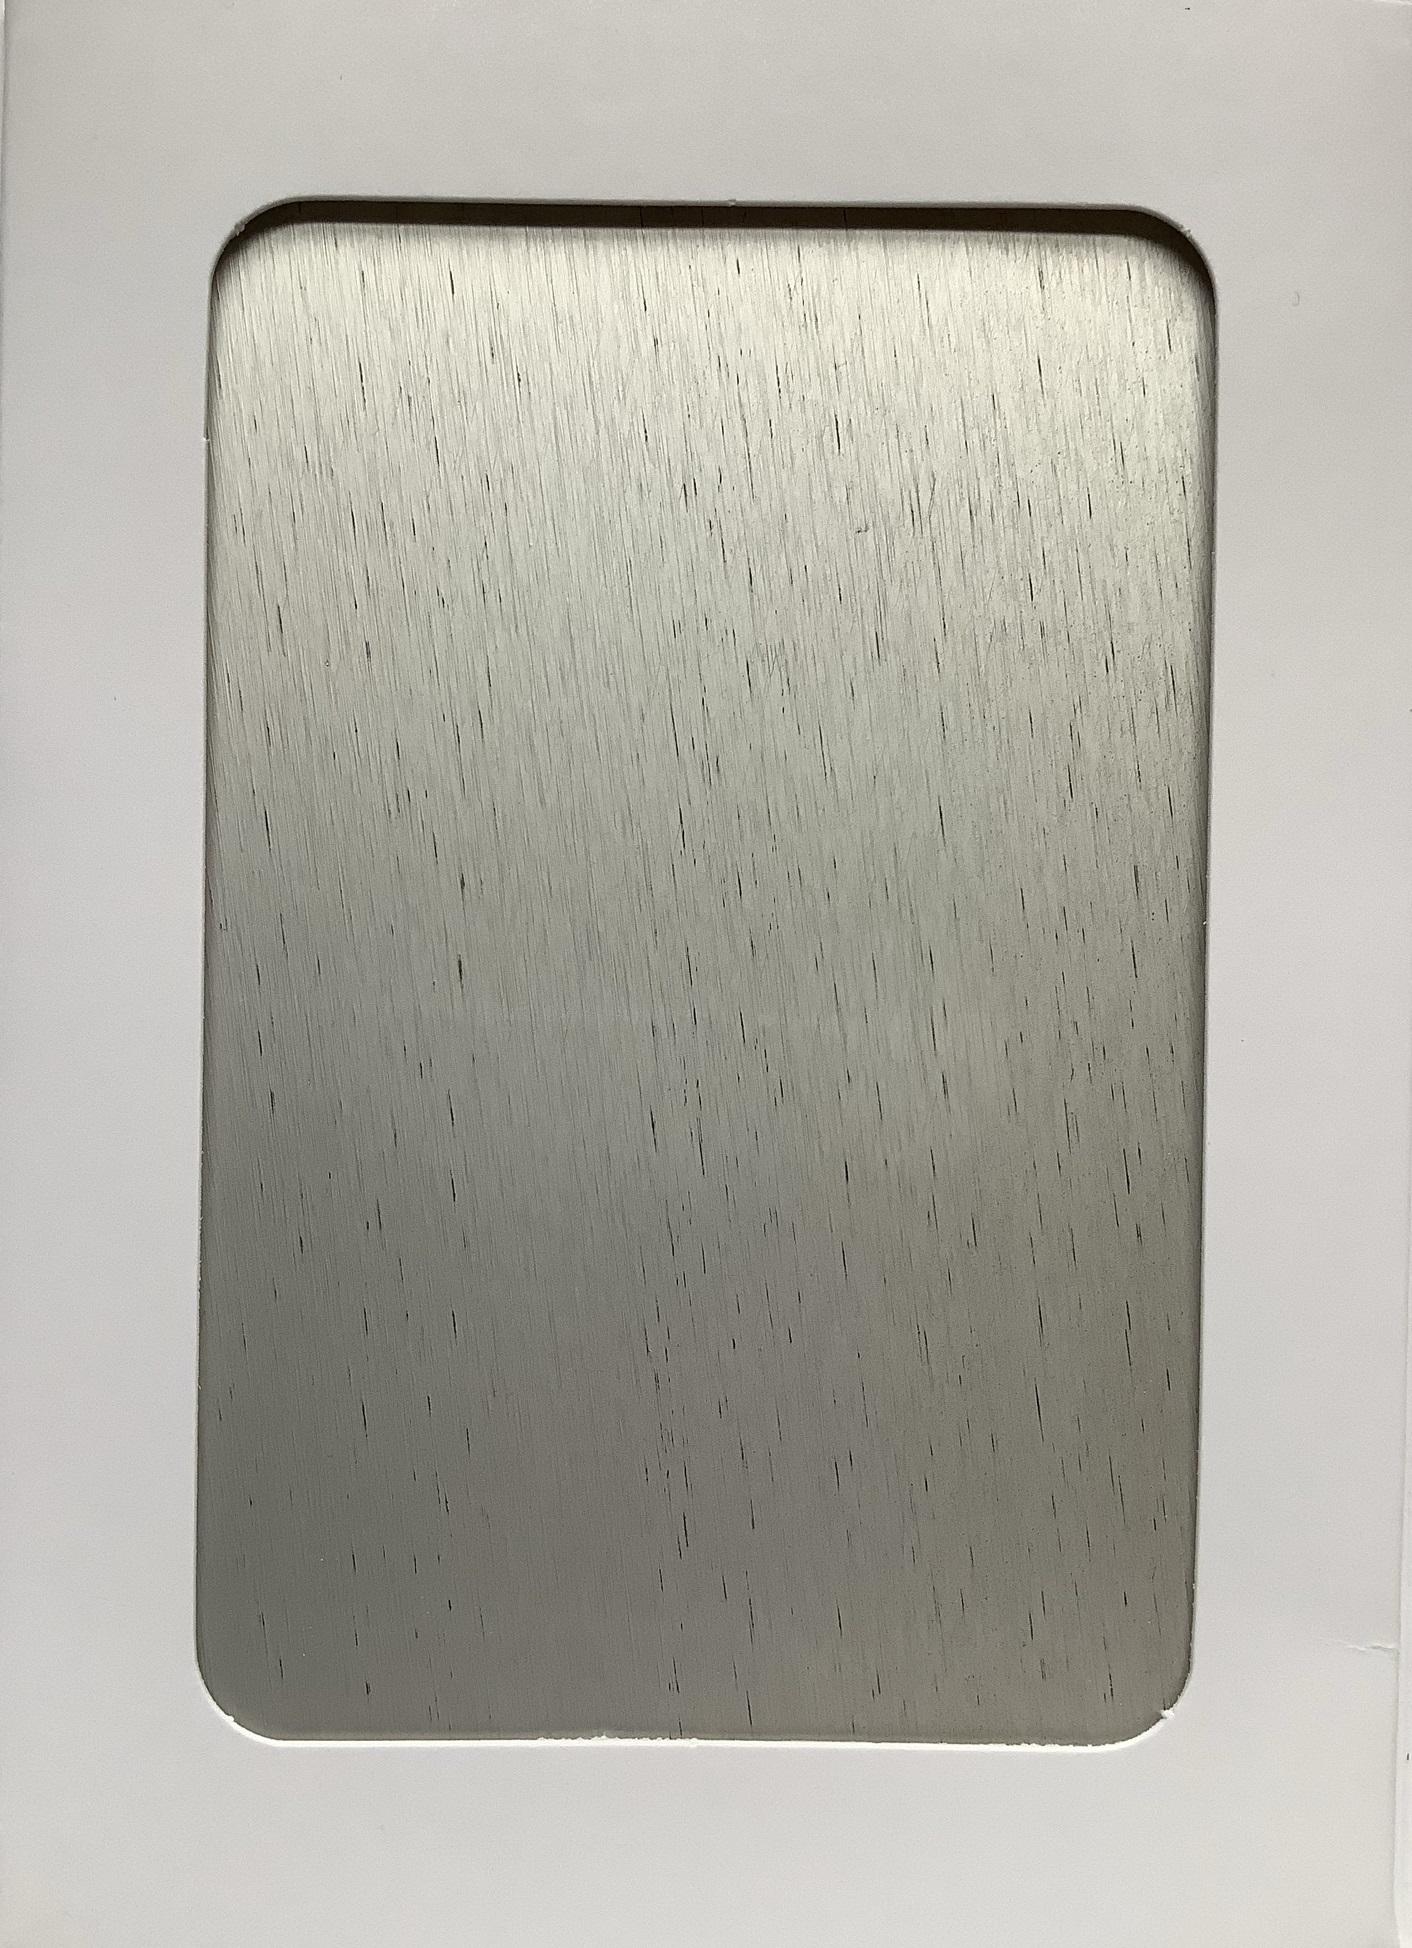 Roofinox Stainless Steel – Tin Matte